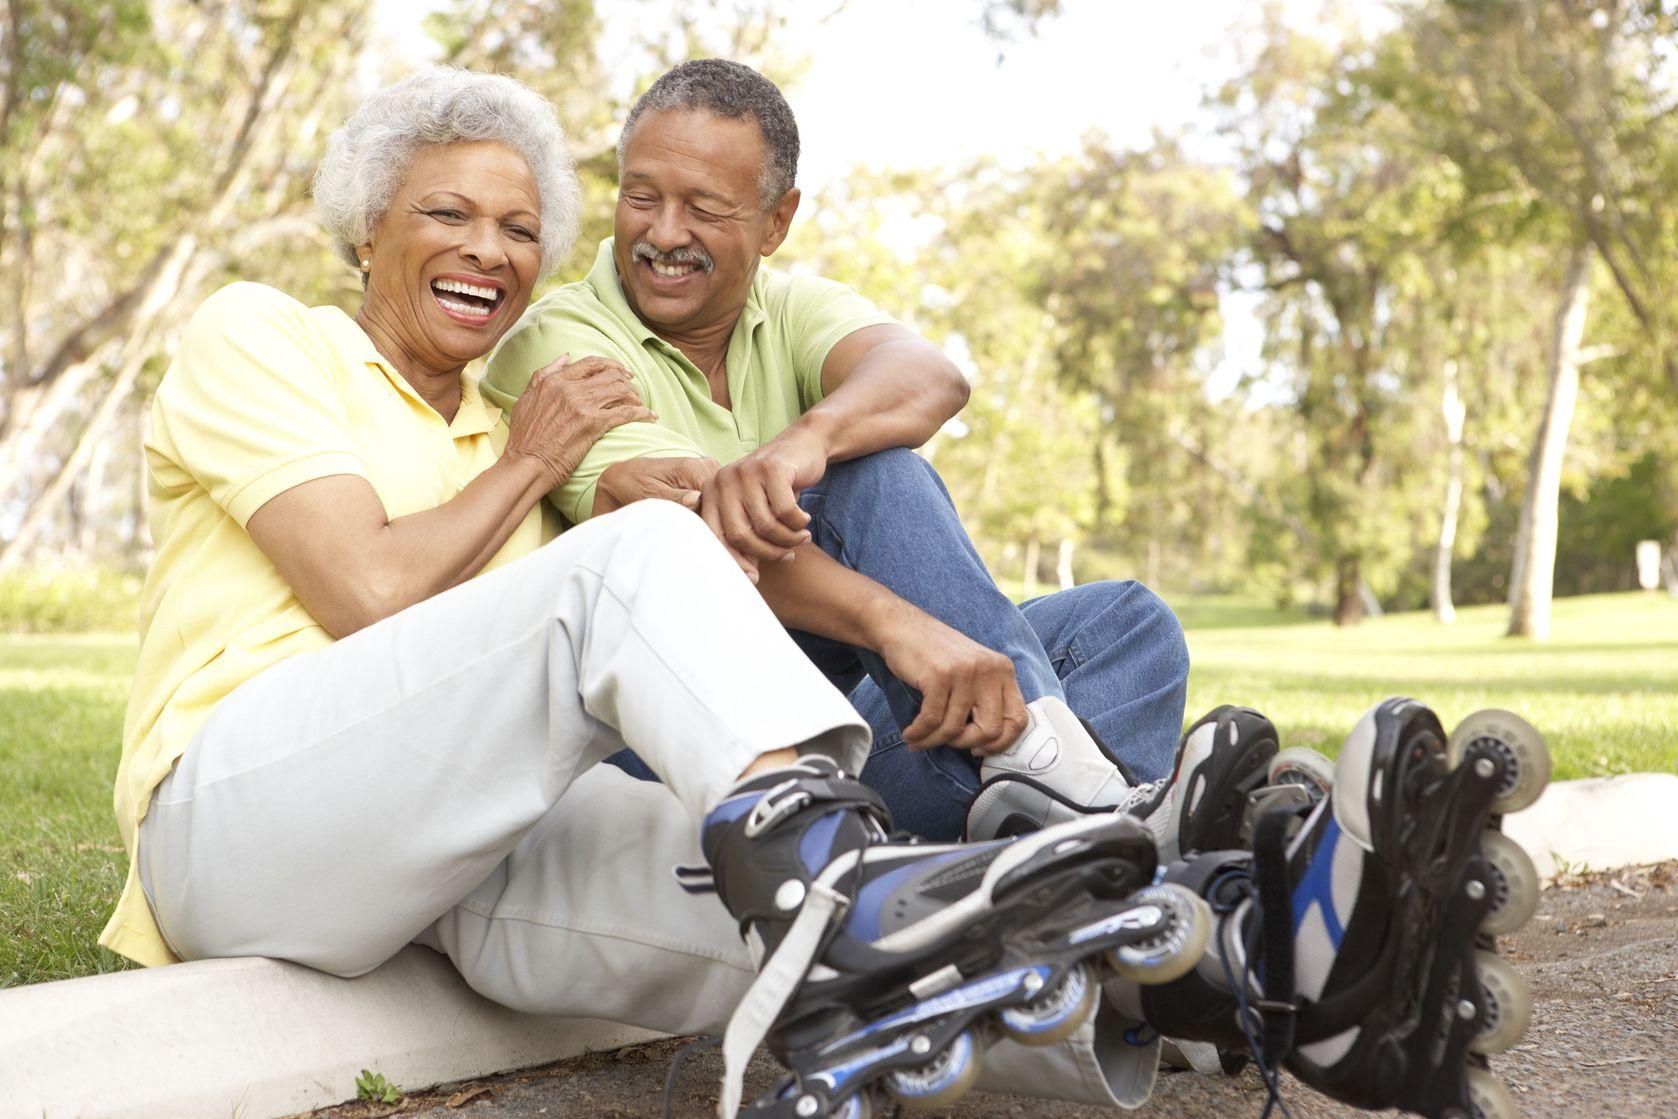 Senior couple aging well